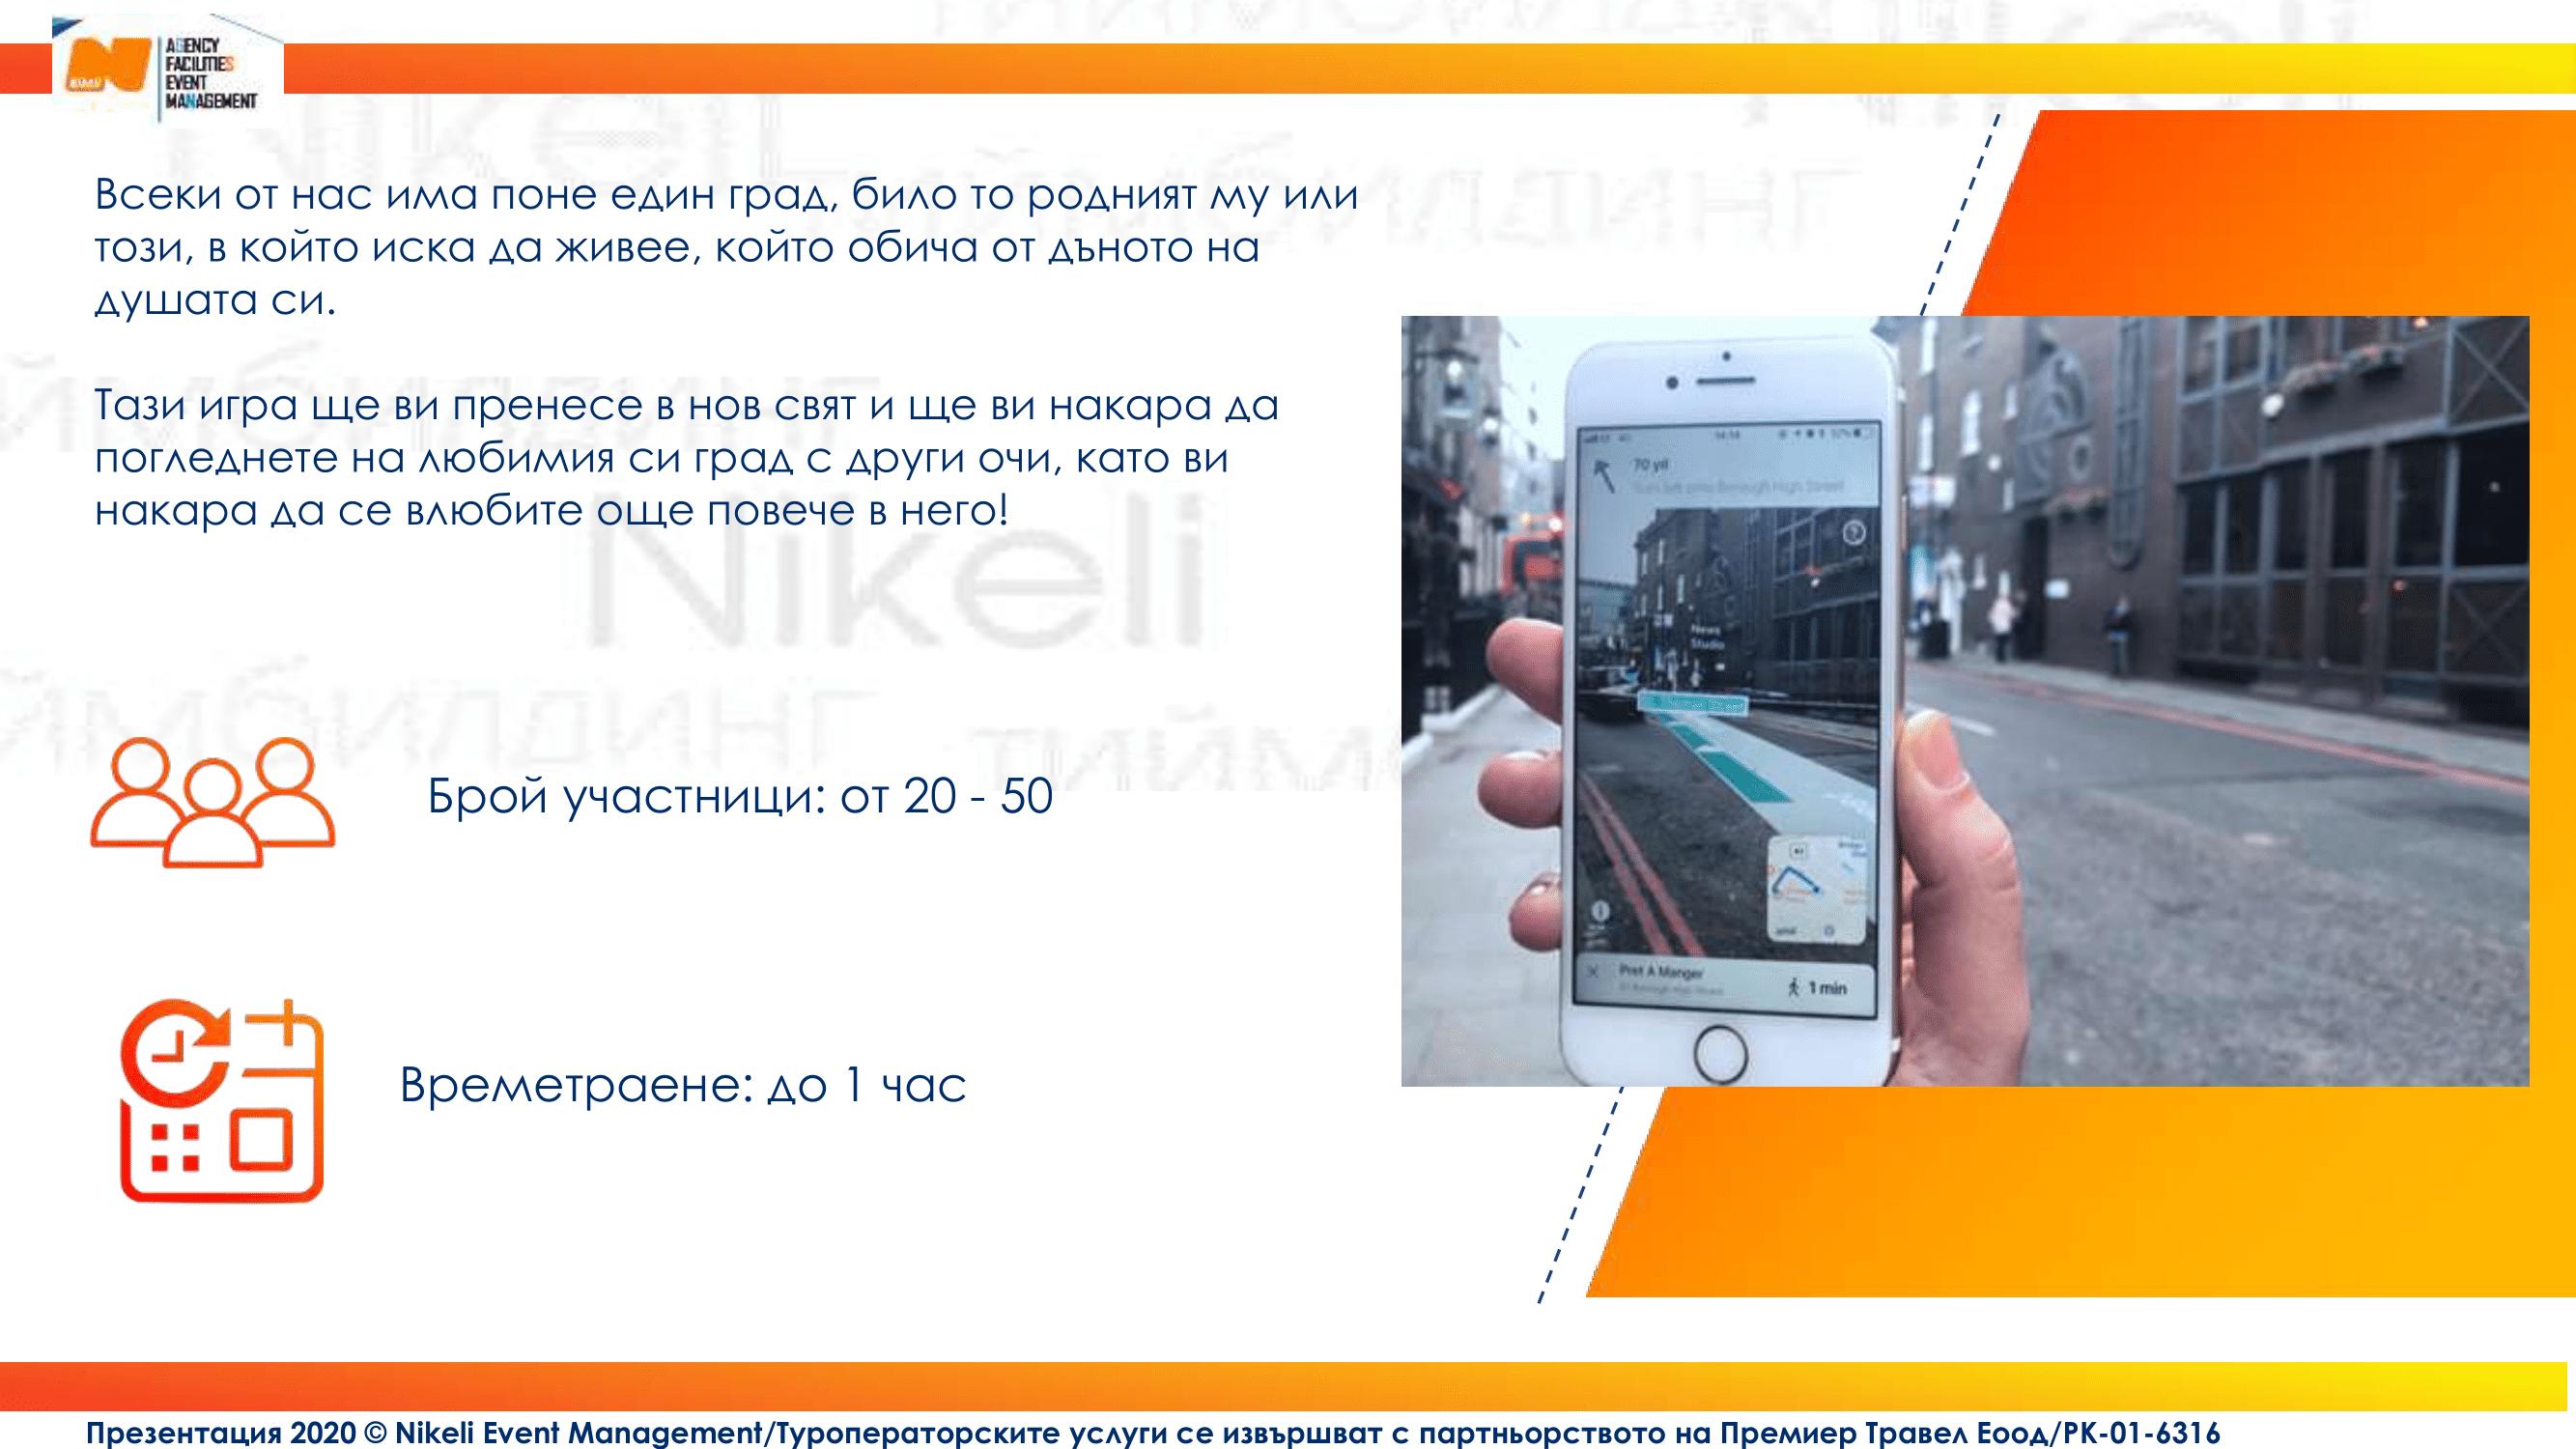 TeamBuilding-Nikeli-Event-Managemen-REA-2020-13